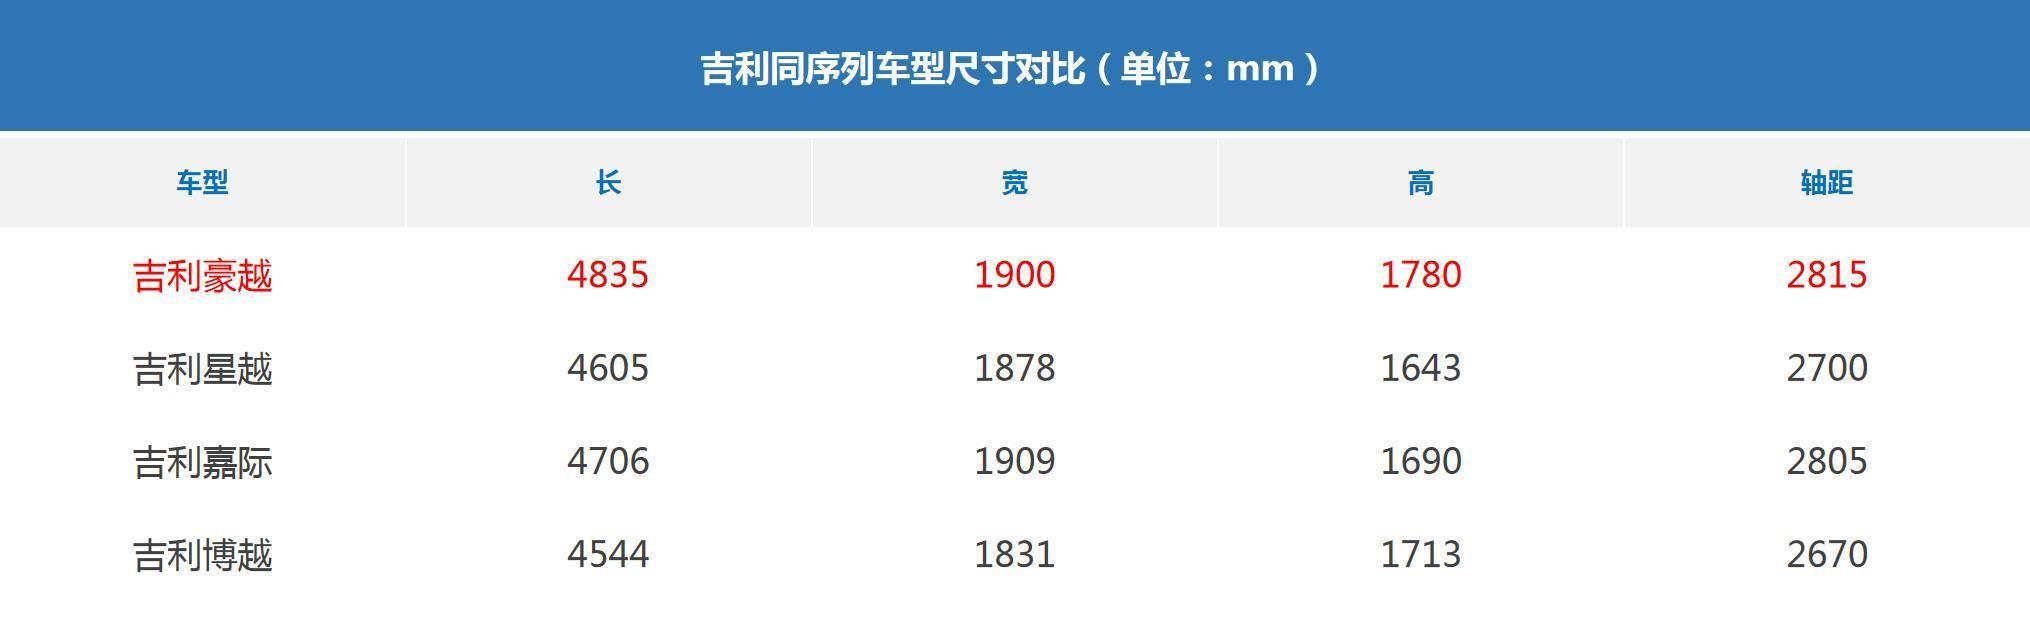 http://cools.qctt.cn/1578754386418.jpeg?imageMogr2/size-limit/1024k!